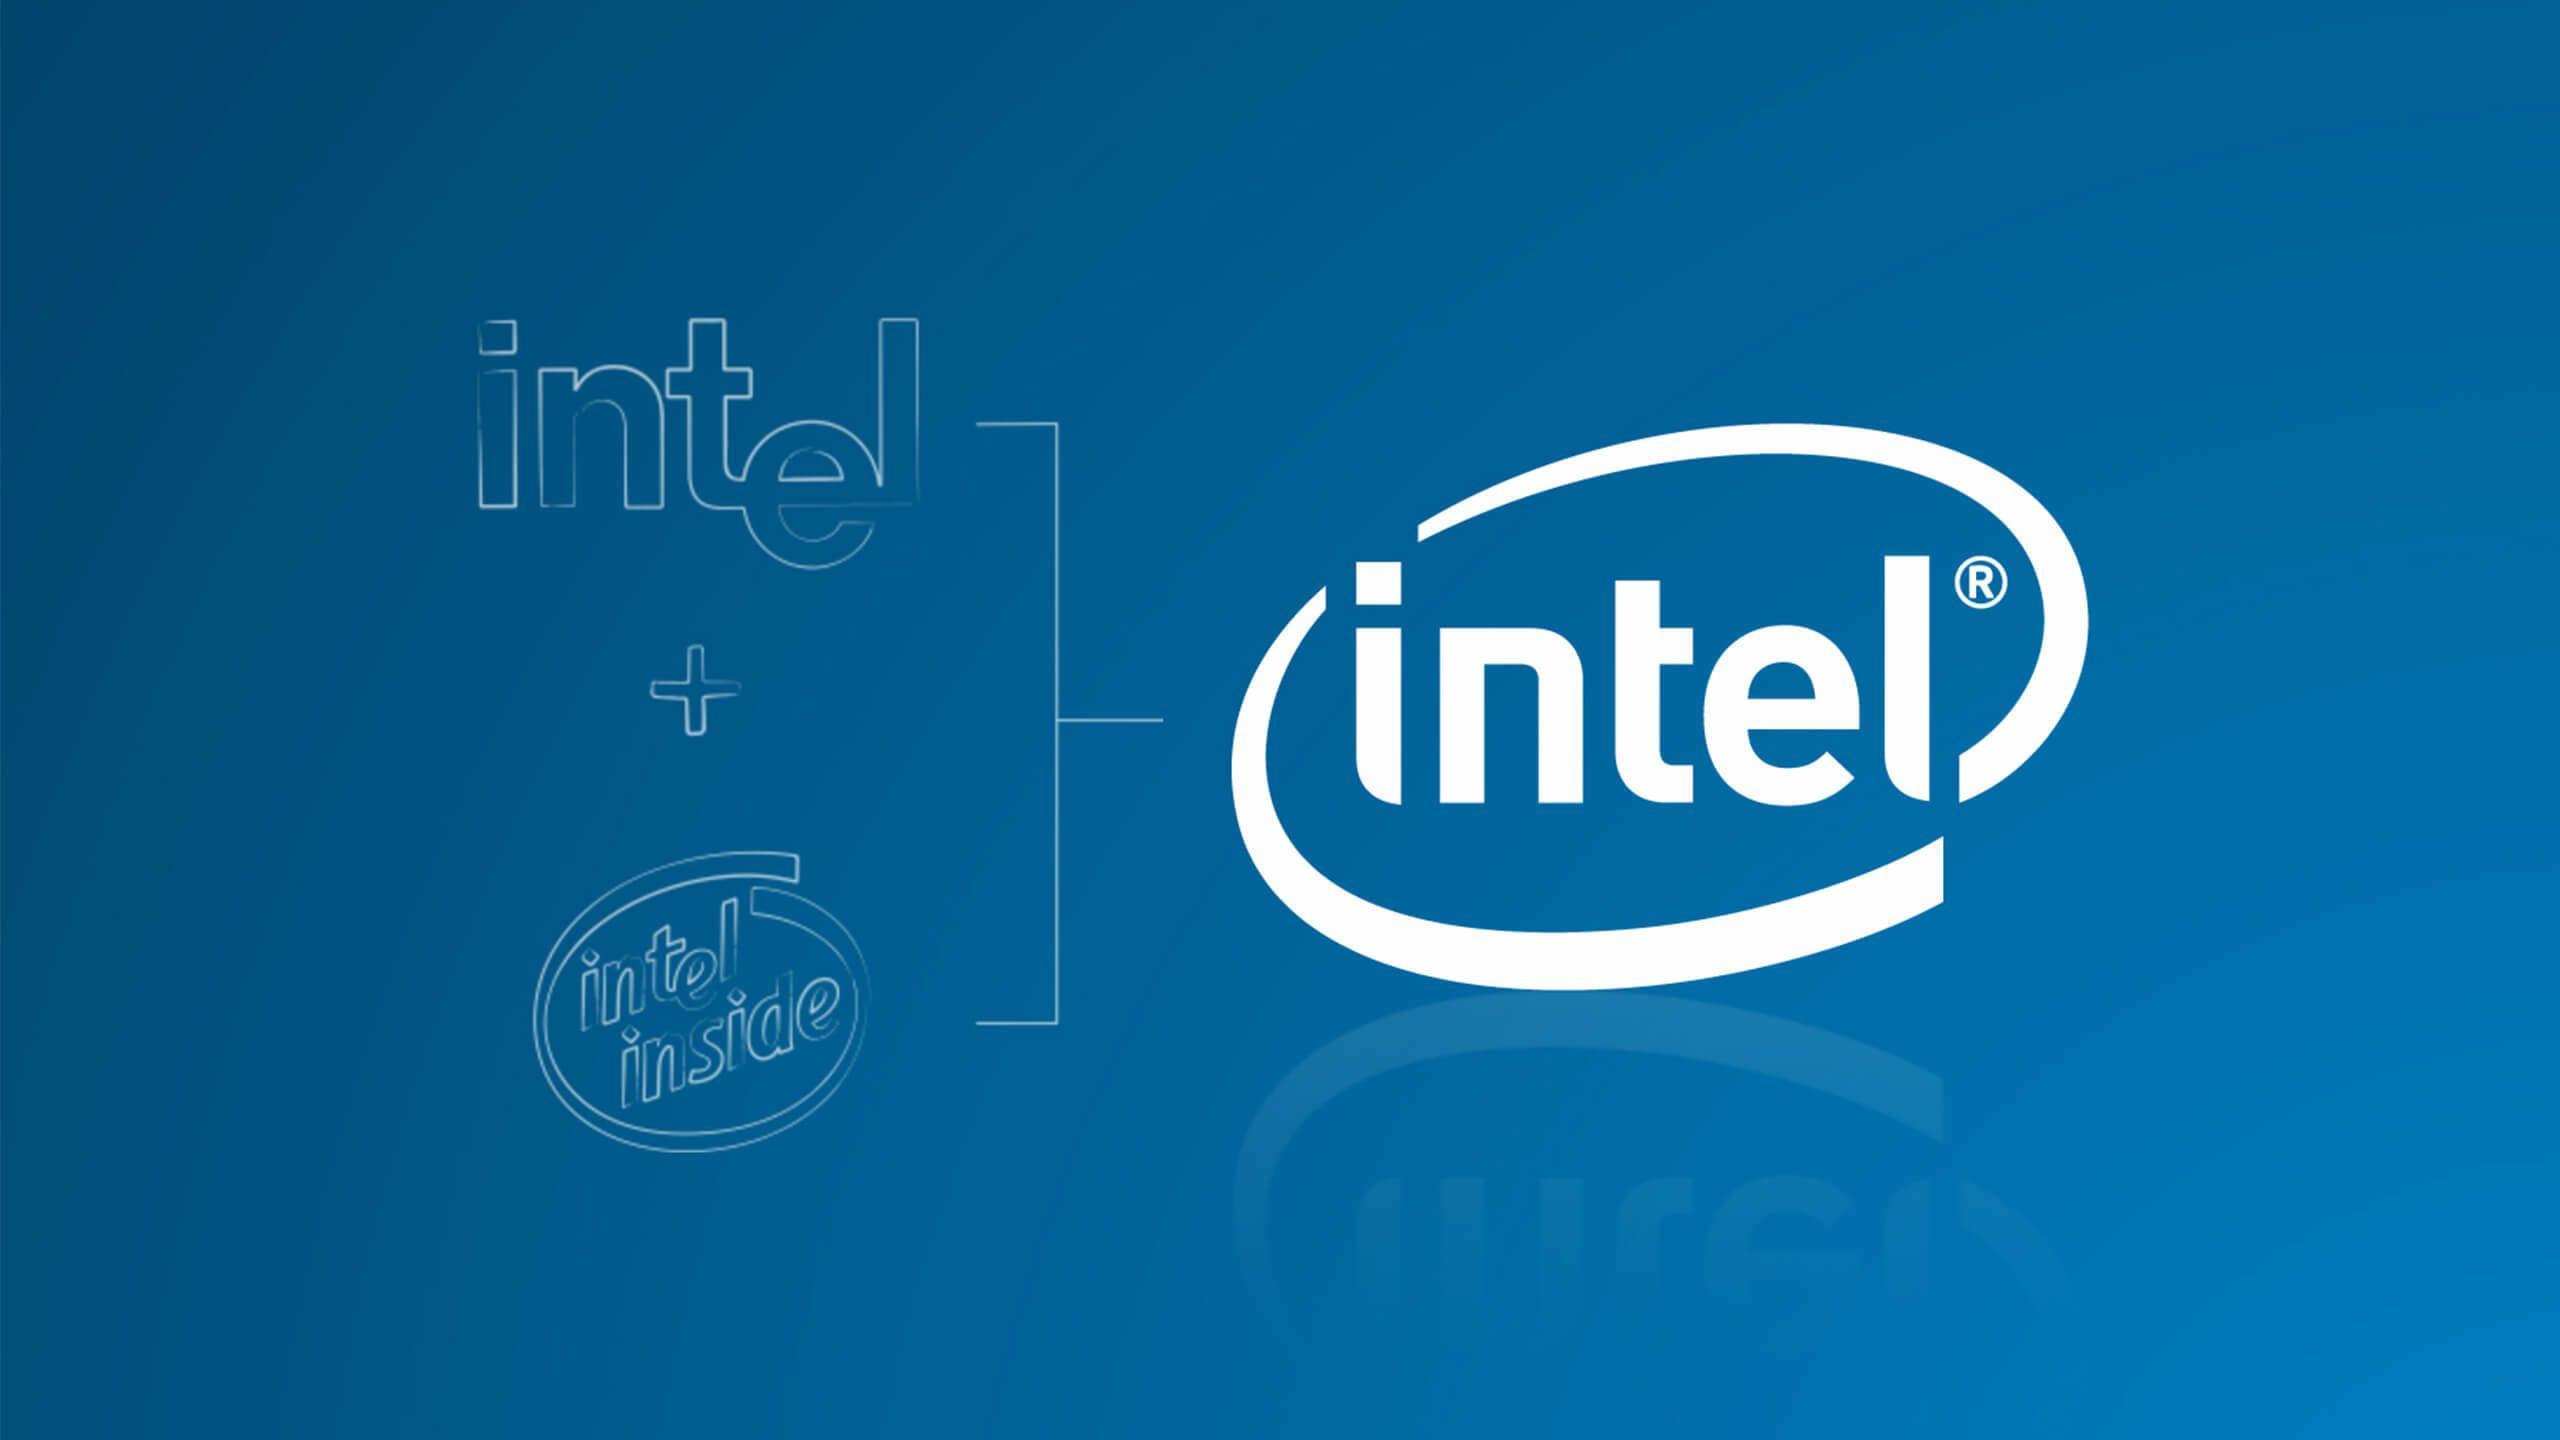 Intel - Futurebrand